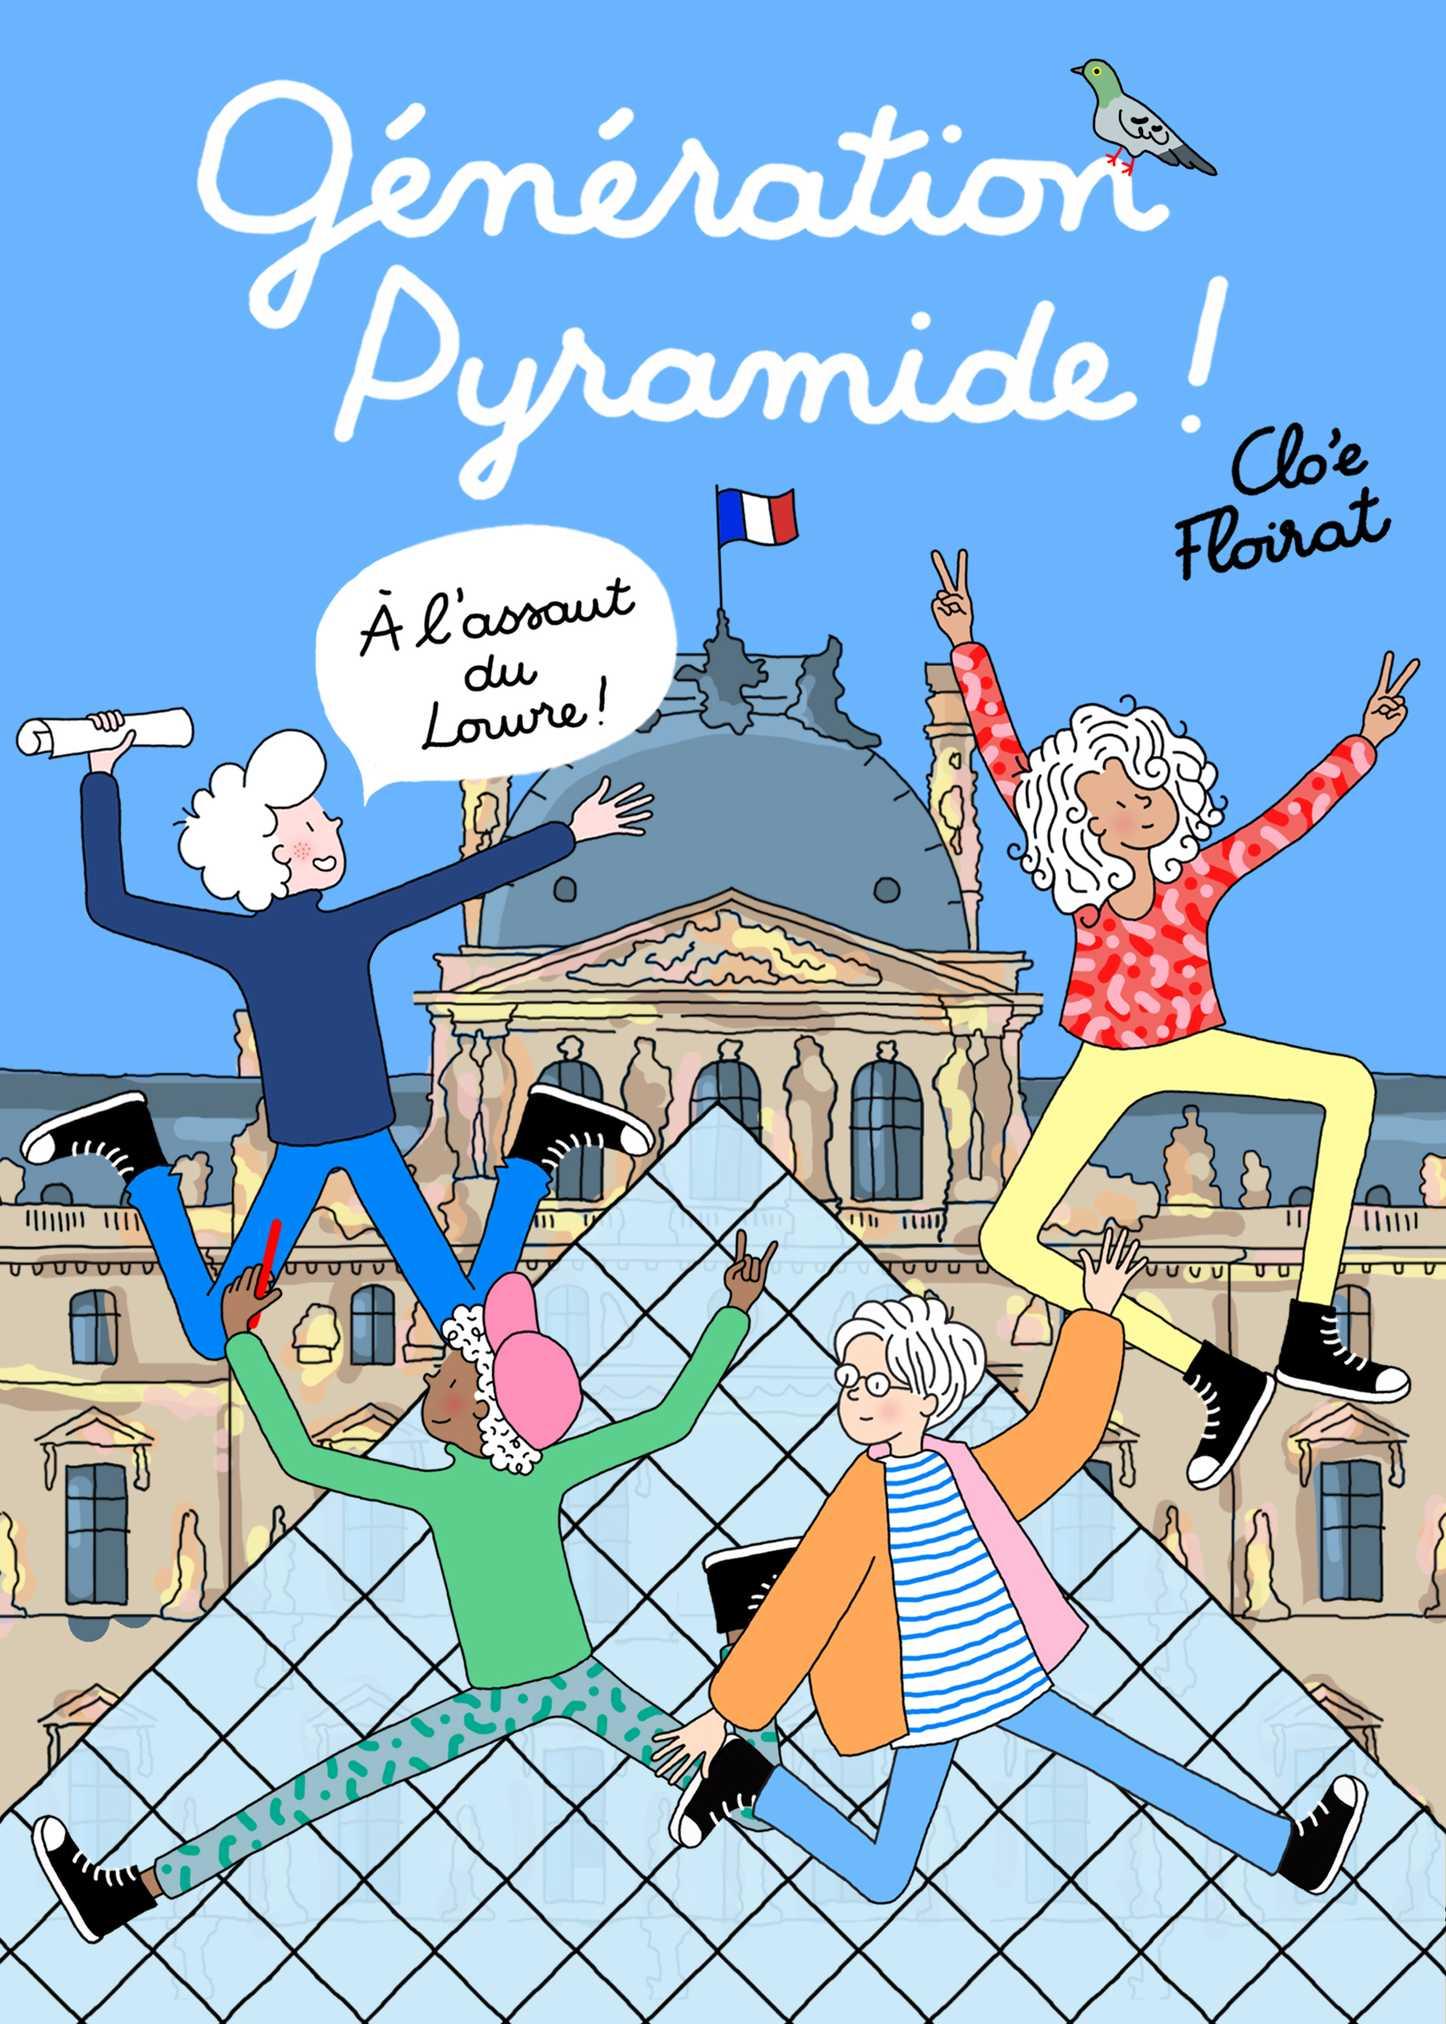 LOUVRE-GenerationPyramide-CLO-17.04.19-1